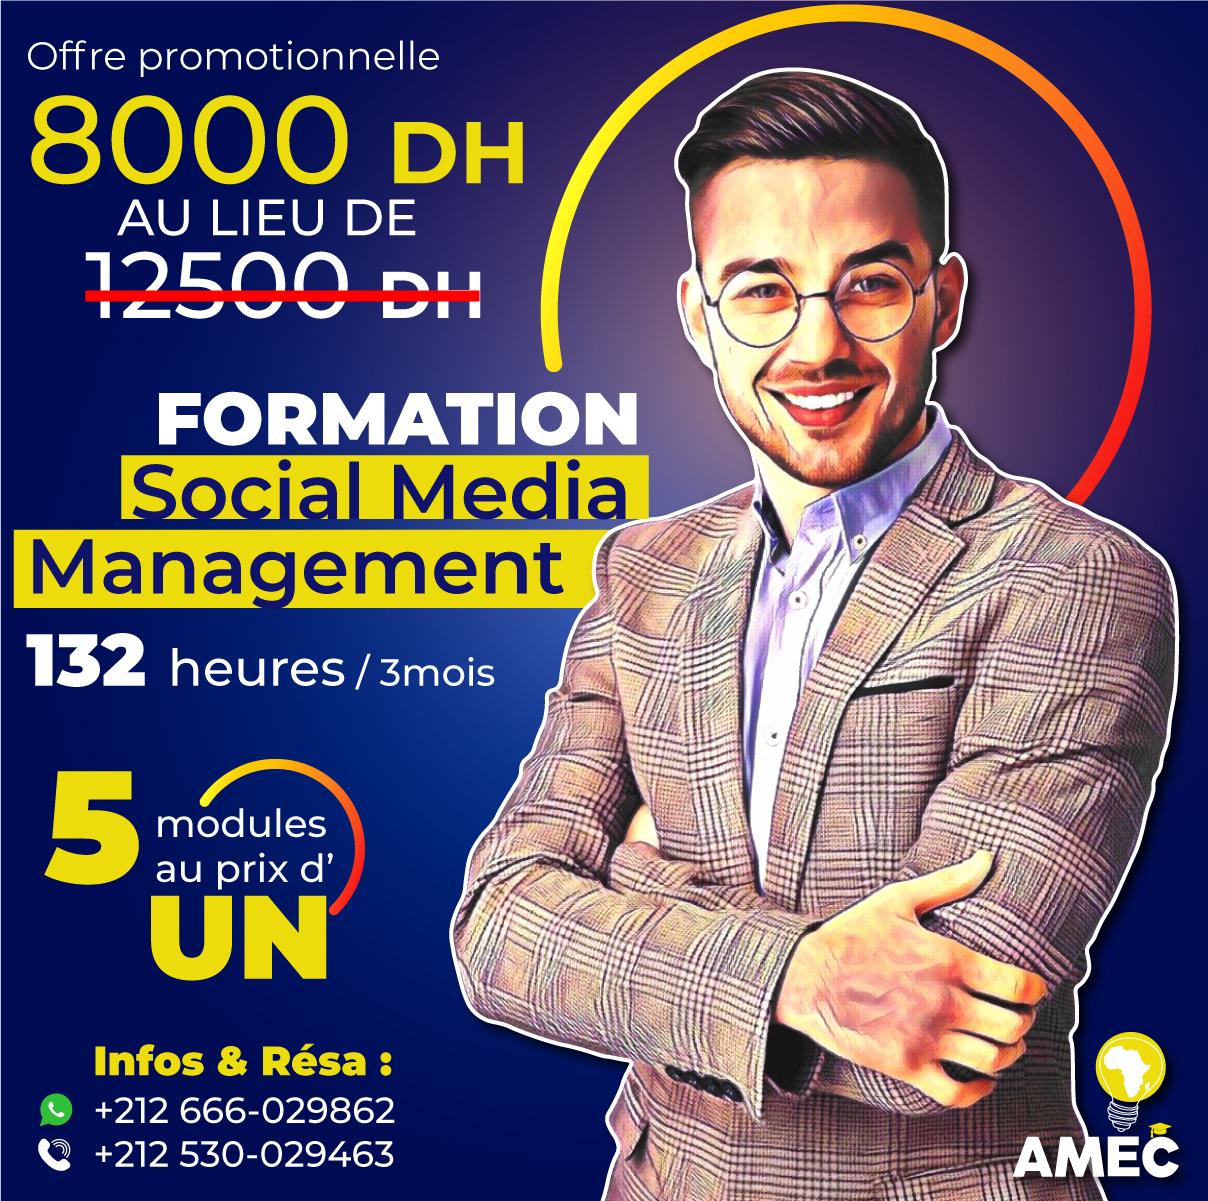 Formation Social Media Management